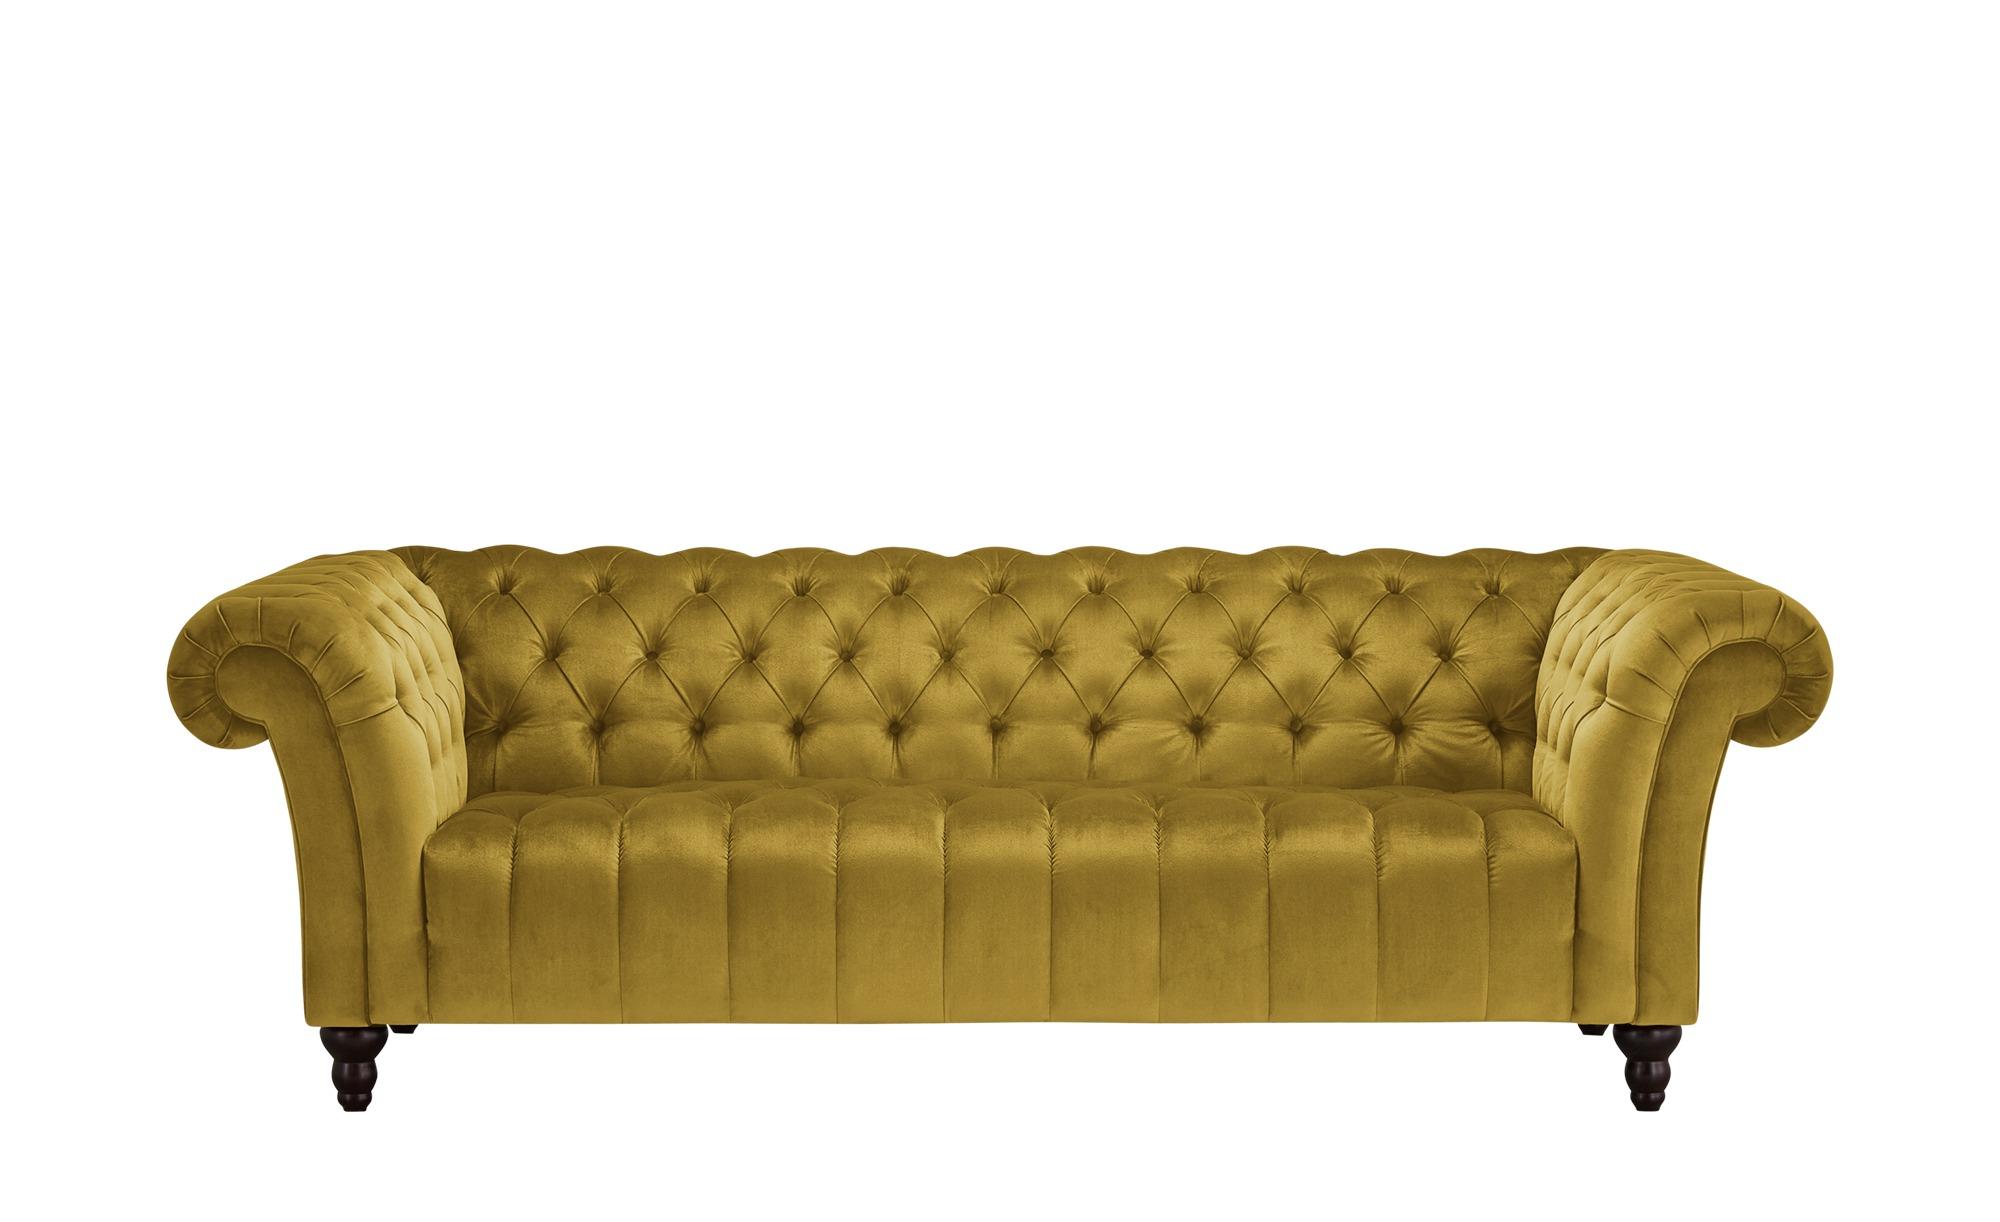 Big Sofa  Canyon ¦ gelb ¦ Maße (cm): B: 230 H: 74 T: 101 Polstermöbel > Sofas > Big-Sofas - Höffner